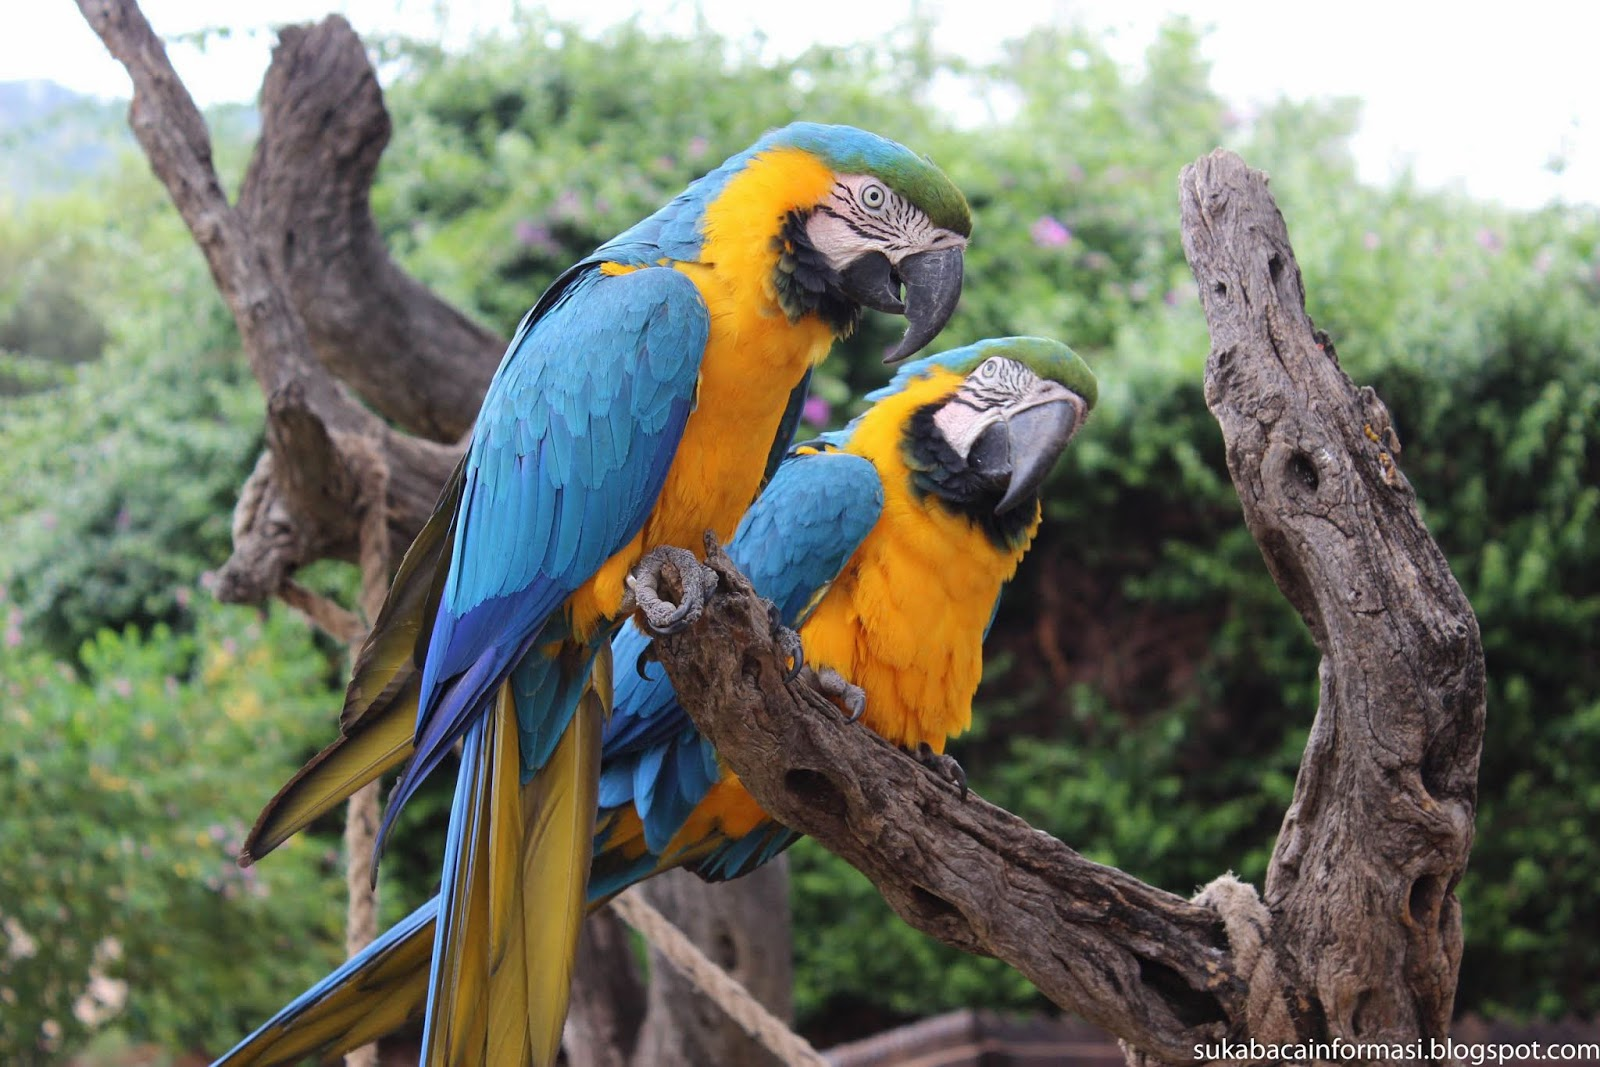 Kumpulan Foto Burung Beo Biru